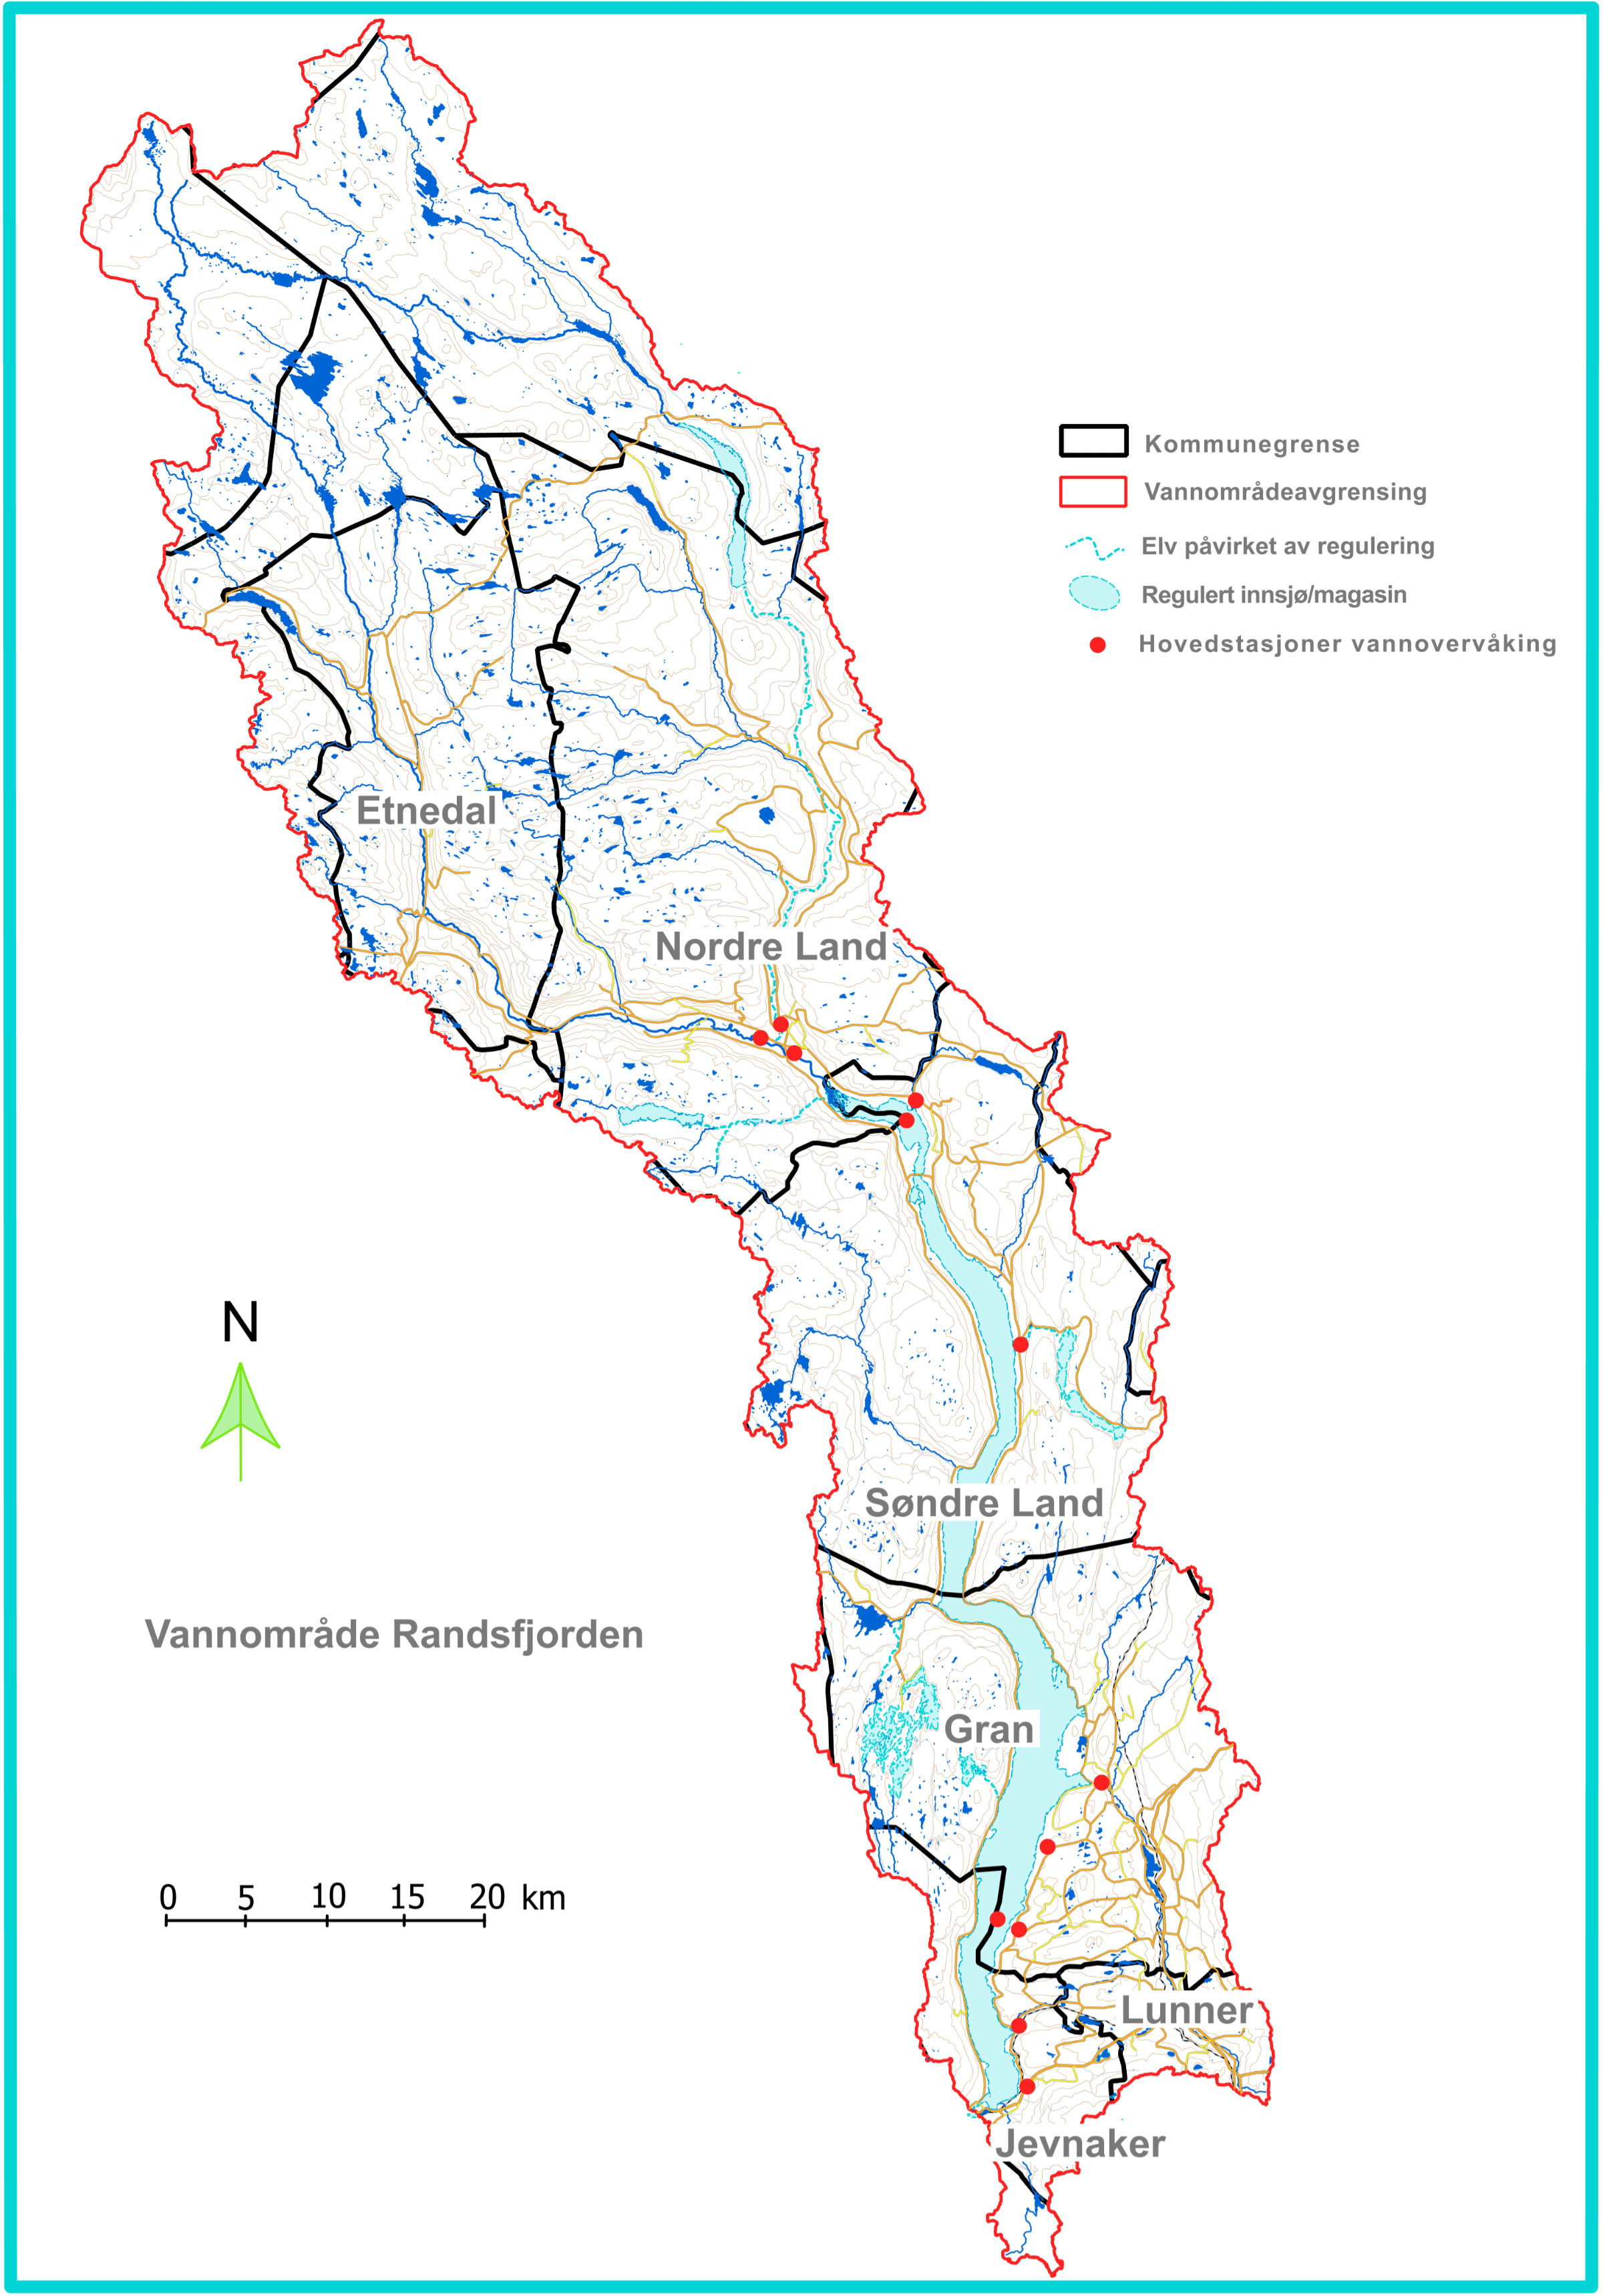 Kart over vannområde Randsfjorden med kommunegrenser